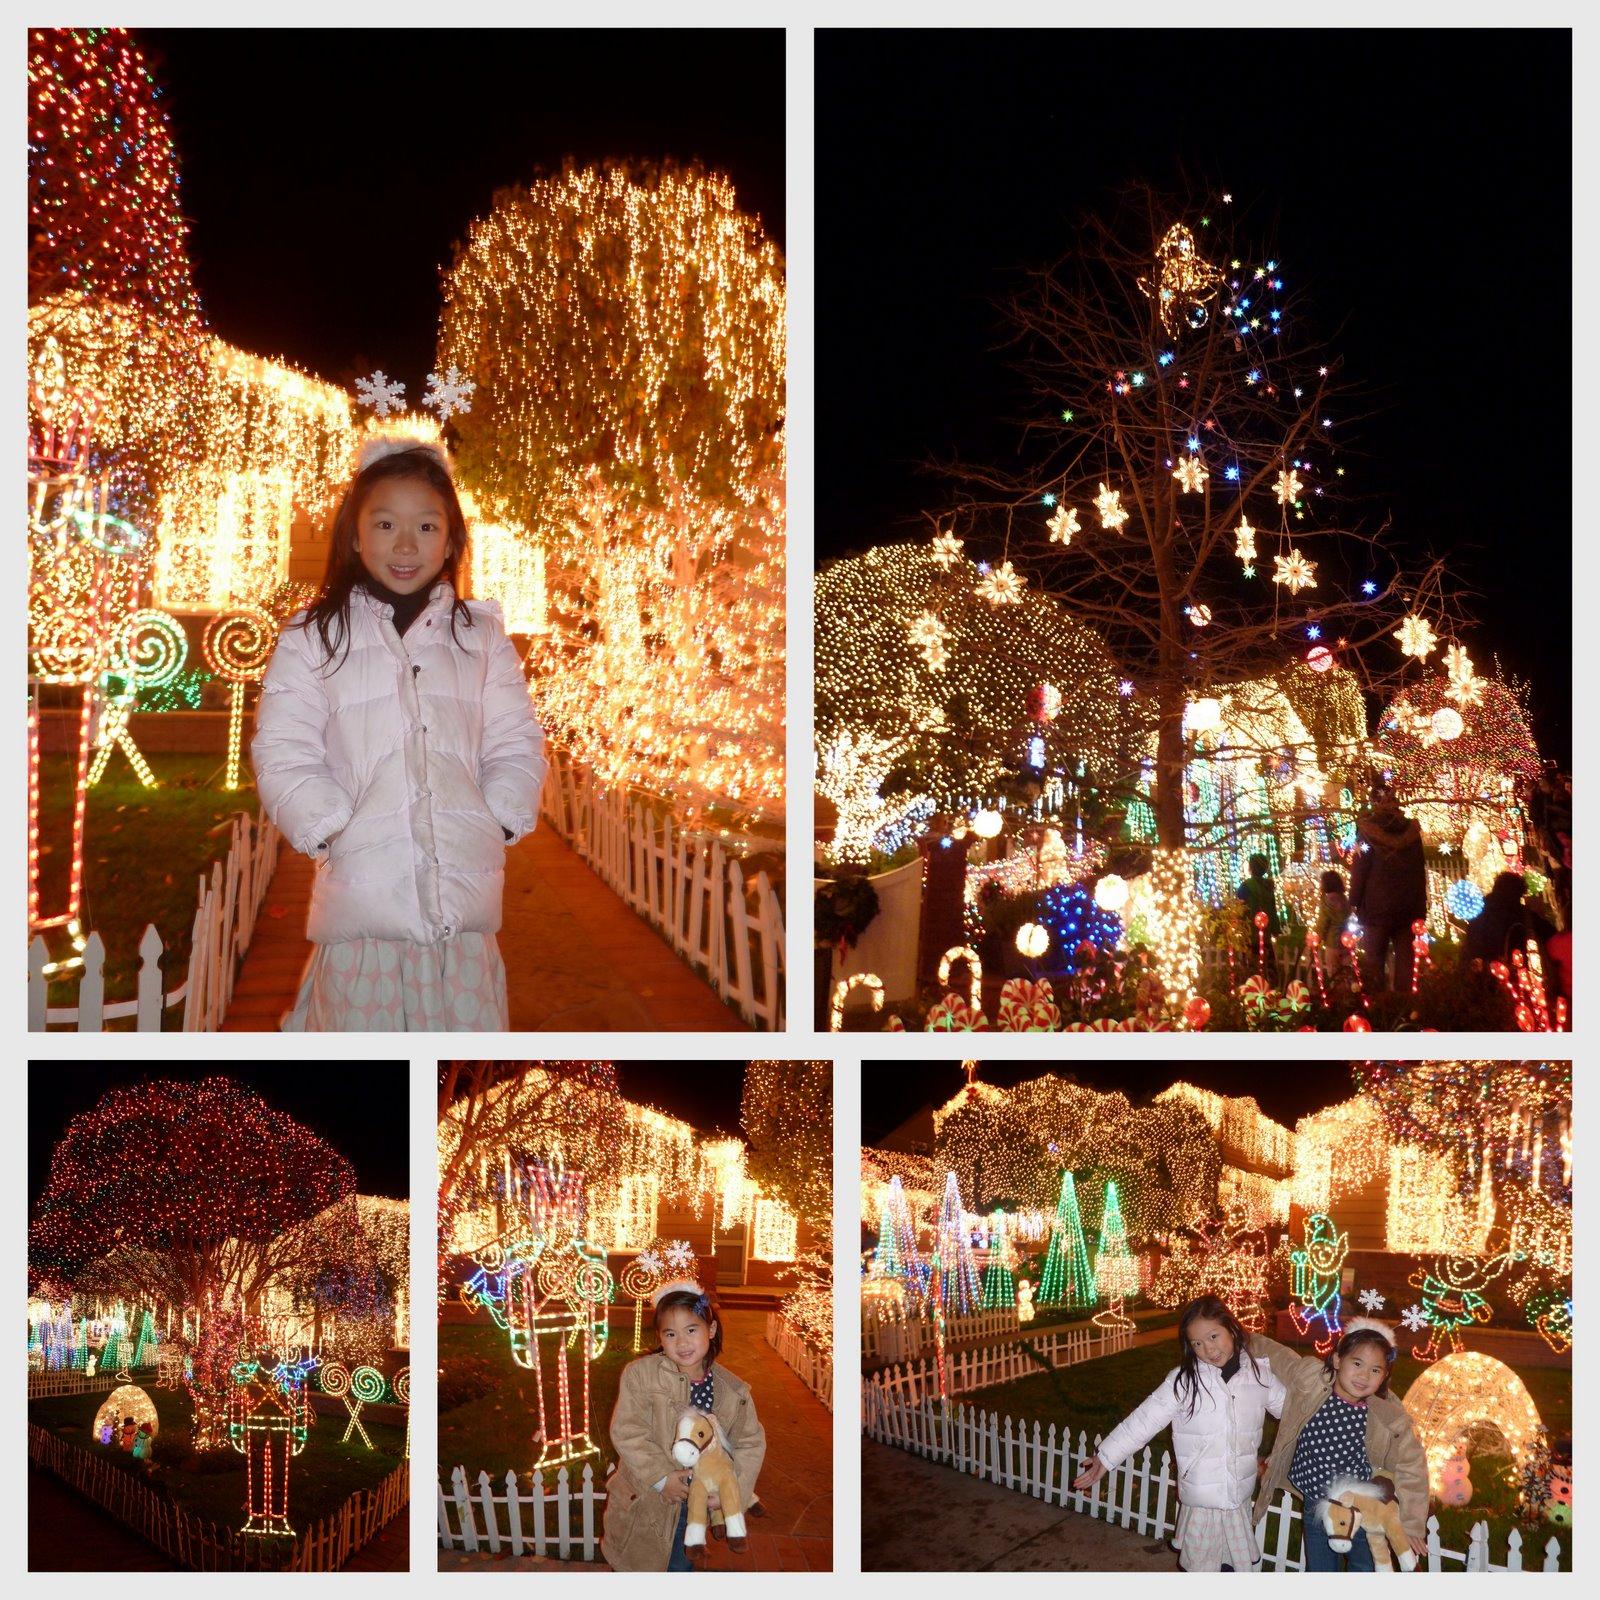 Ella S Daytrips Christmas Lights Eucalyptus Ave San Carlos